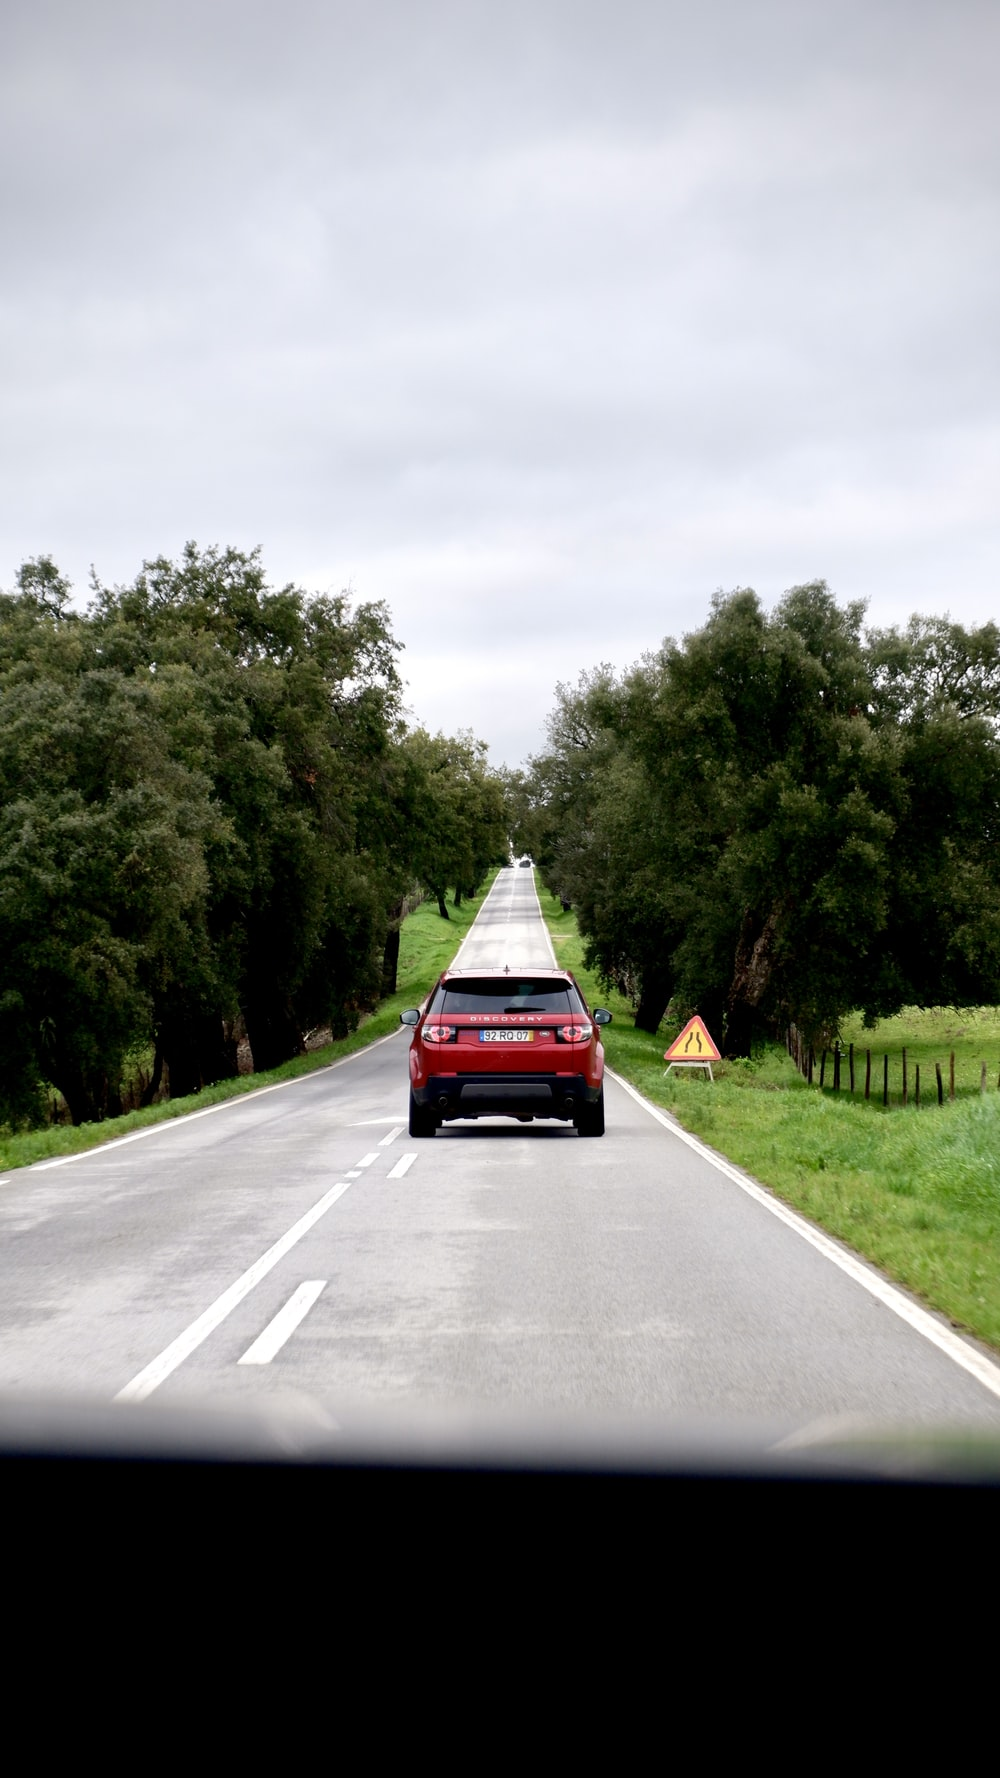 red car on gray asphalt road during daytime